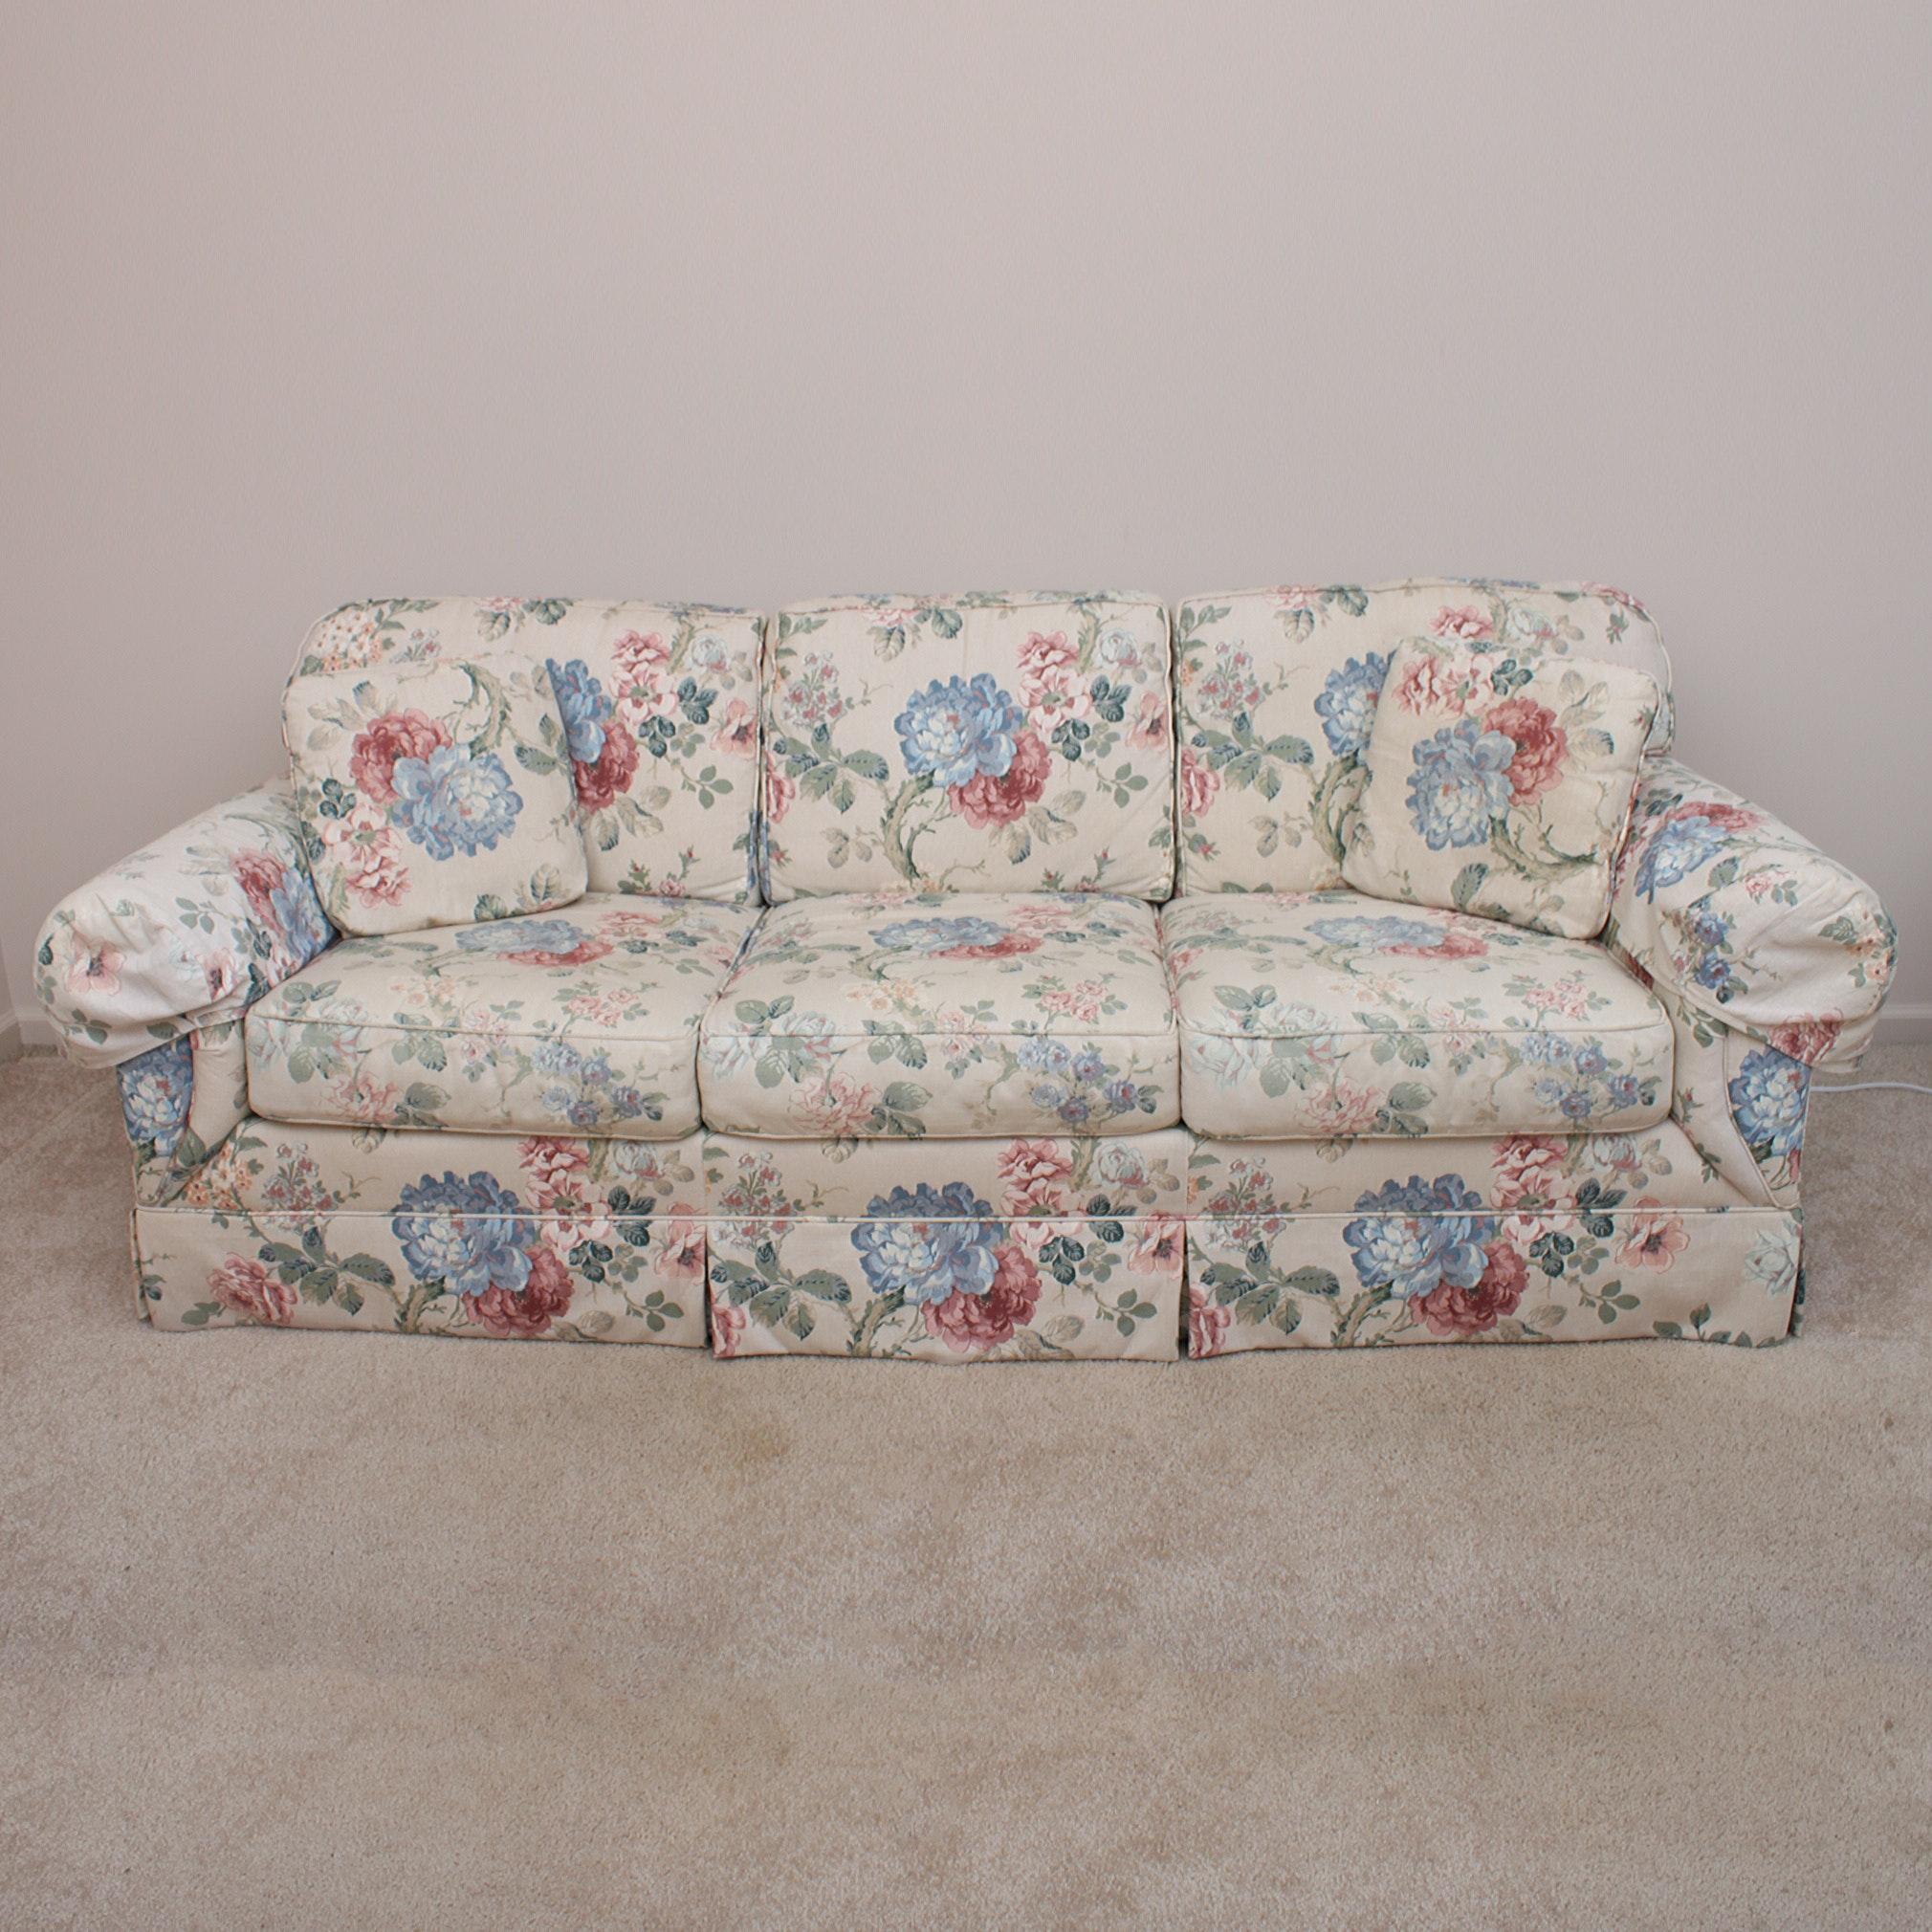 Drexel Floral Sofa